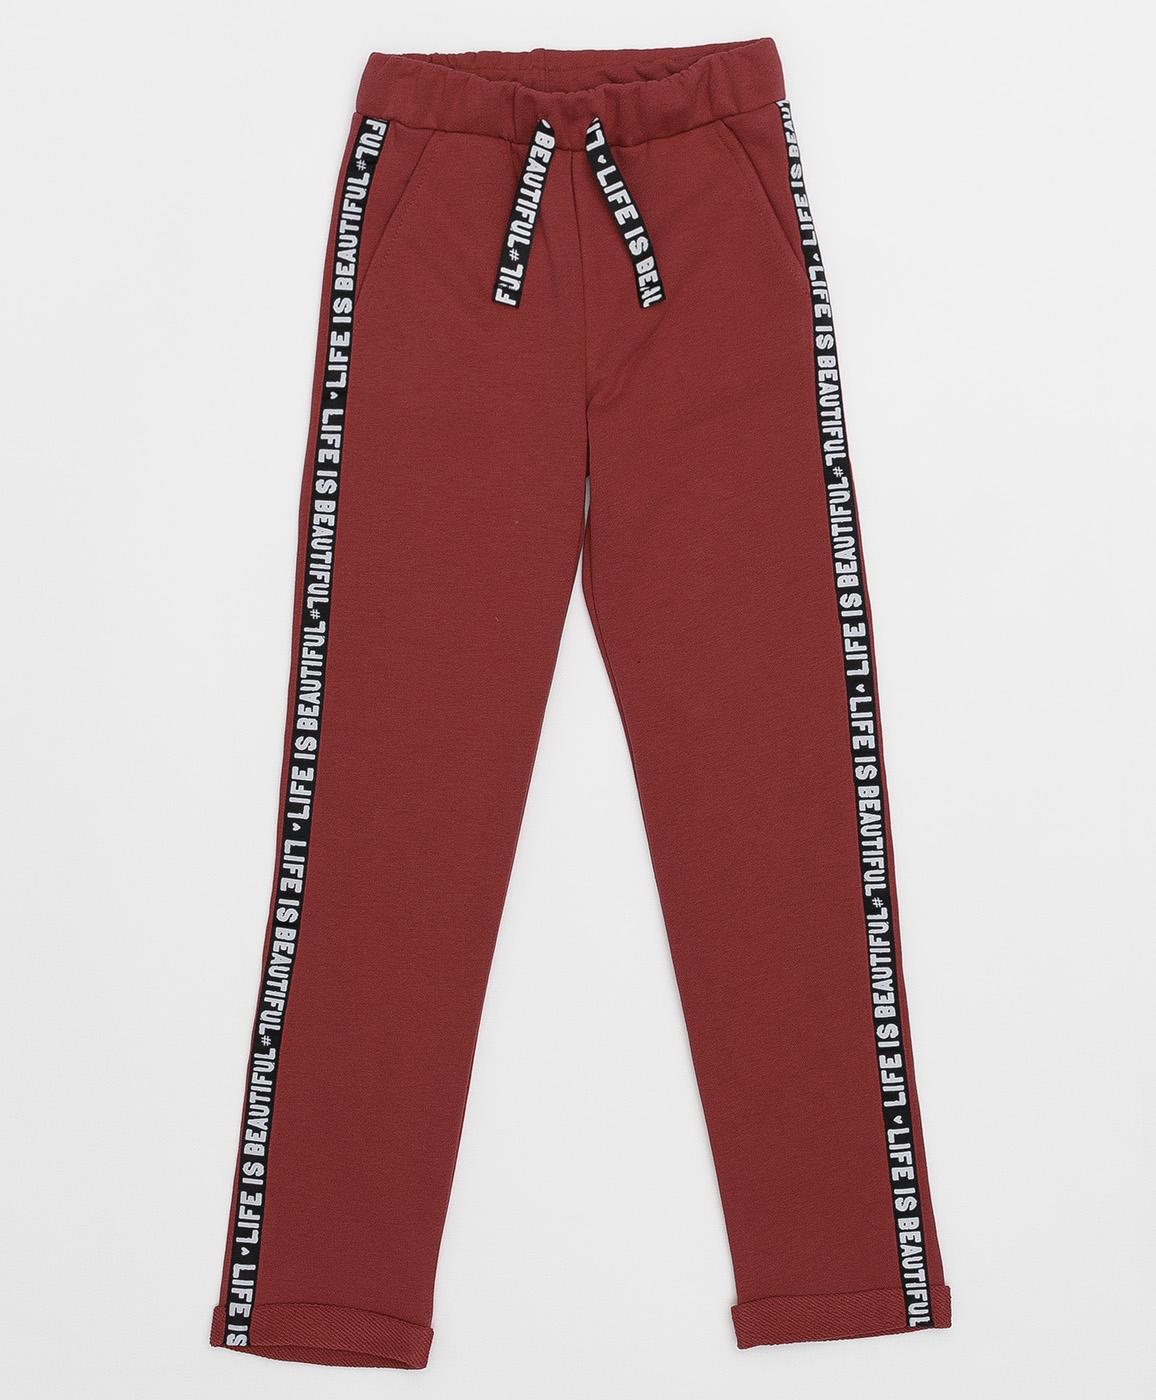 Купить 220BBGJC56033500, Розовые брюки с лампасами Button Blue, розовый, 152, Футер, Женский, Зима, ОСЕНЬ/ЗИМА 2020-2021 (shop: GulliverMarket Gulliver Market)